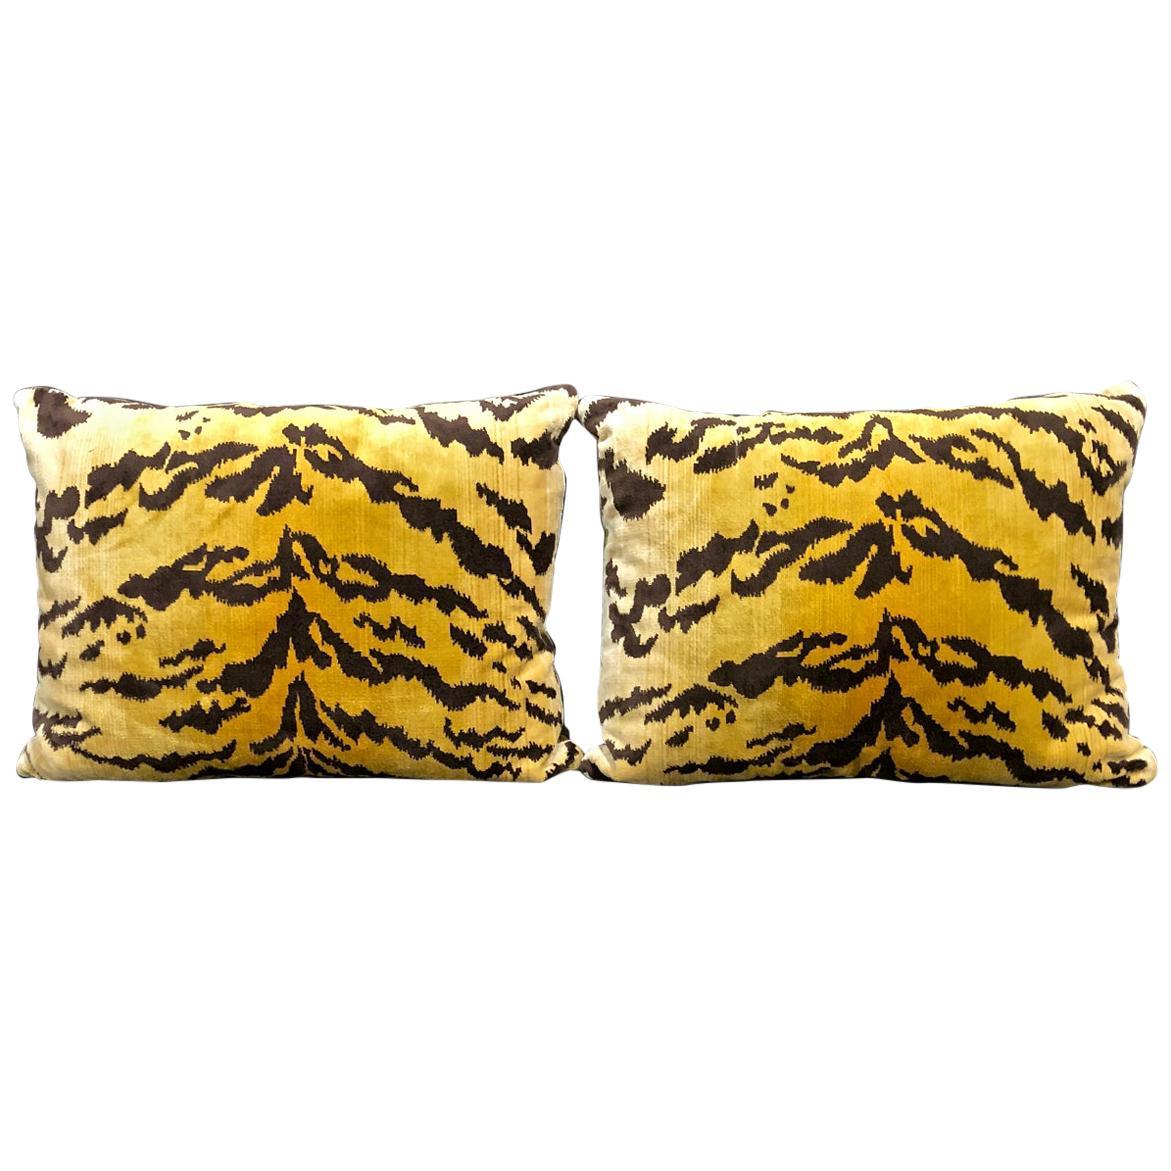 "Pair Scalamandre ""Le Tigre"" Pillows"